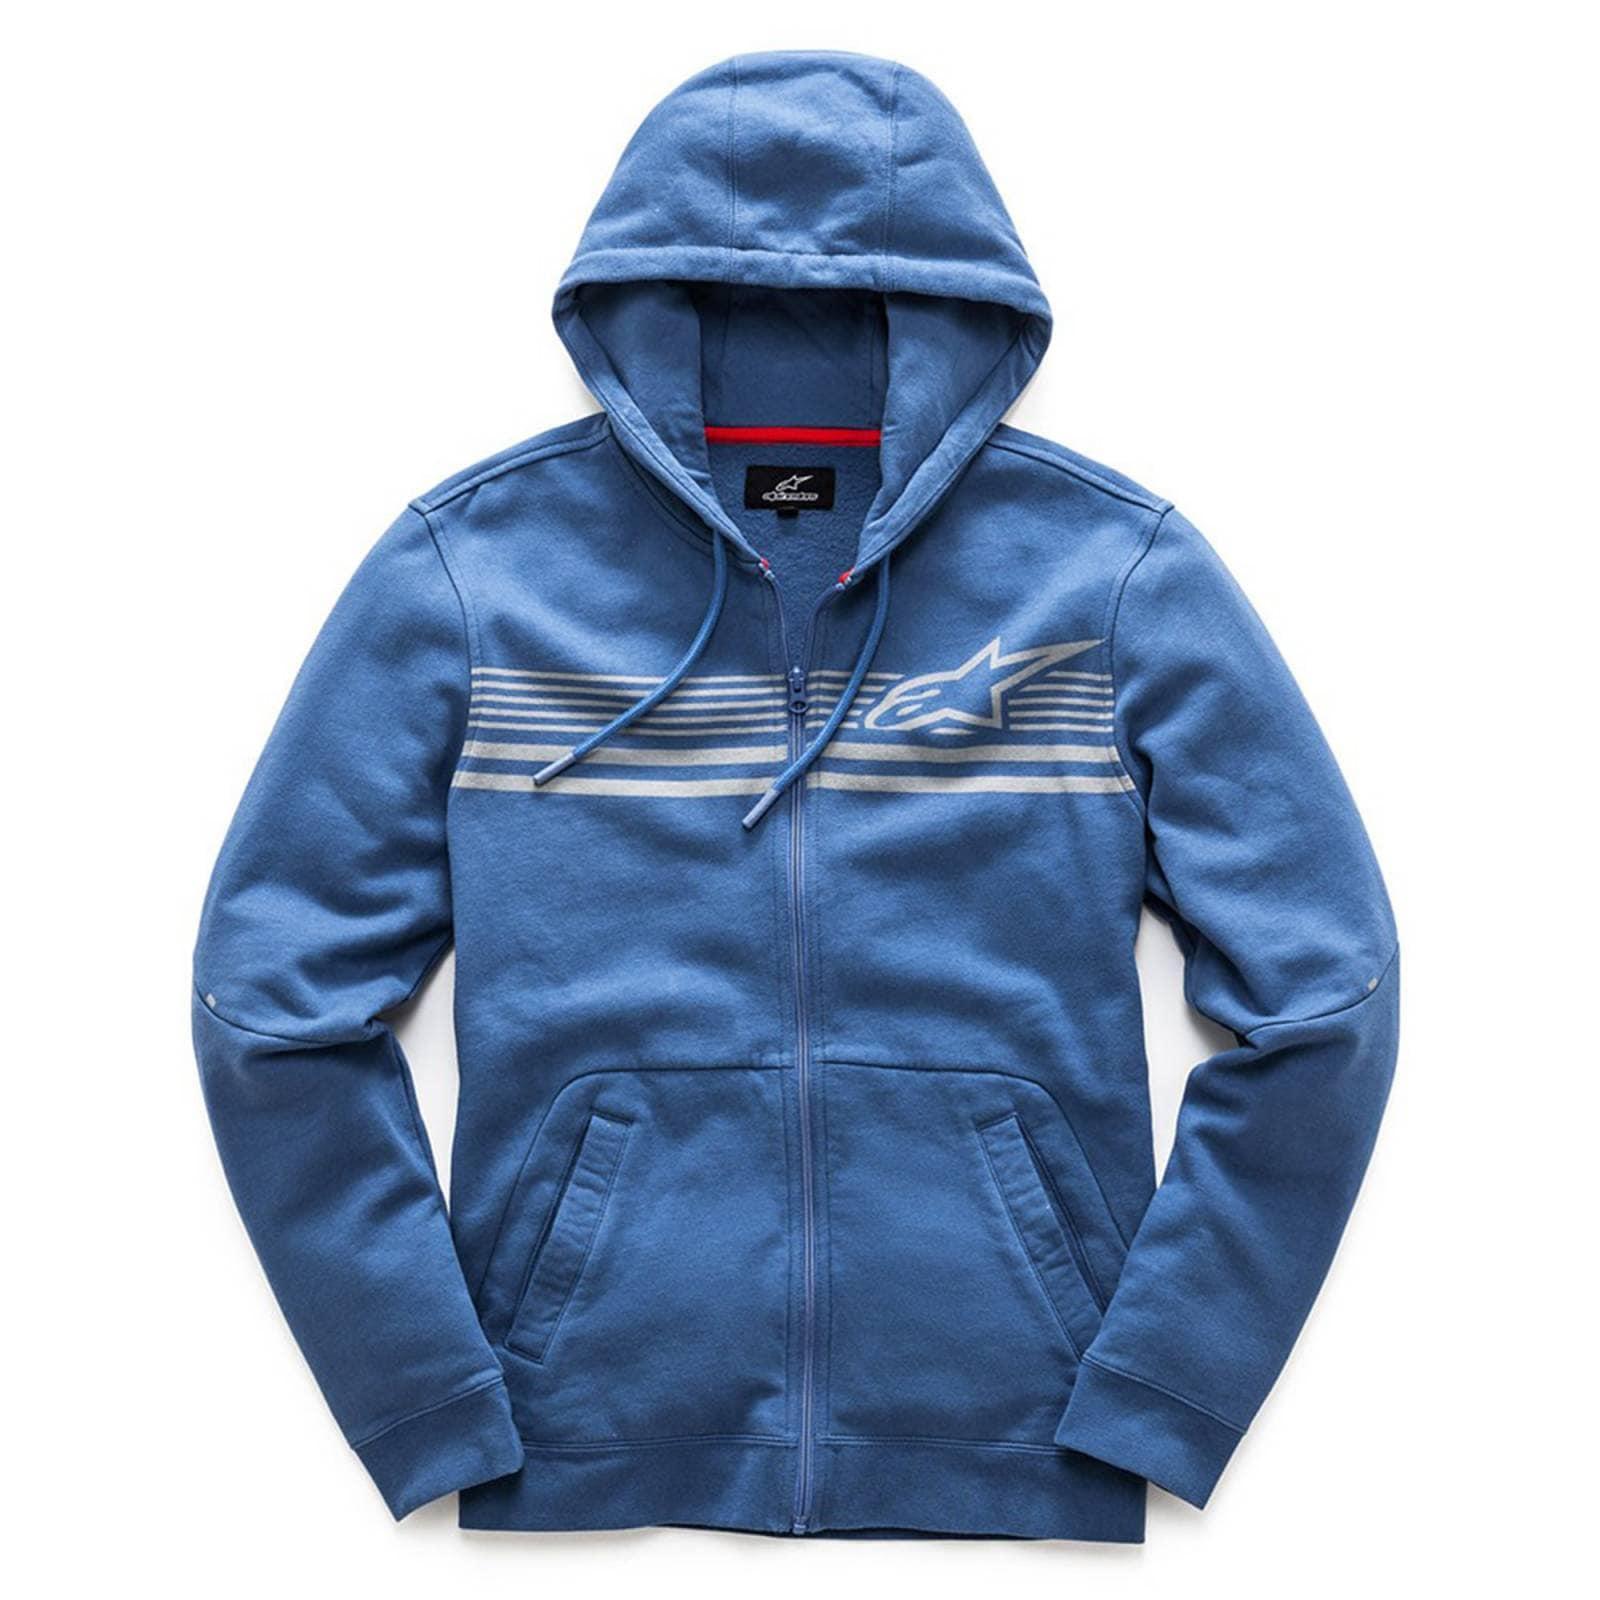 Alpinestars Sudadera Con Gorra Y Zipper Dynamic Fleece Azul